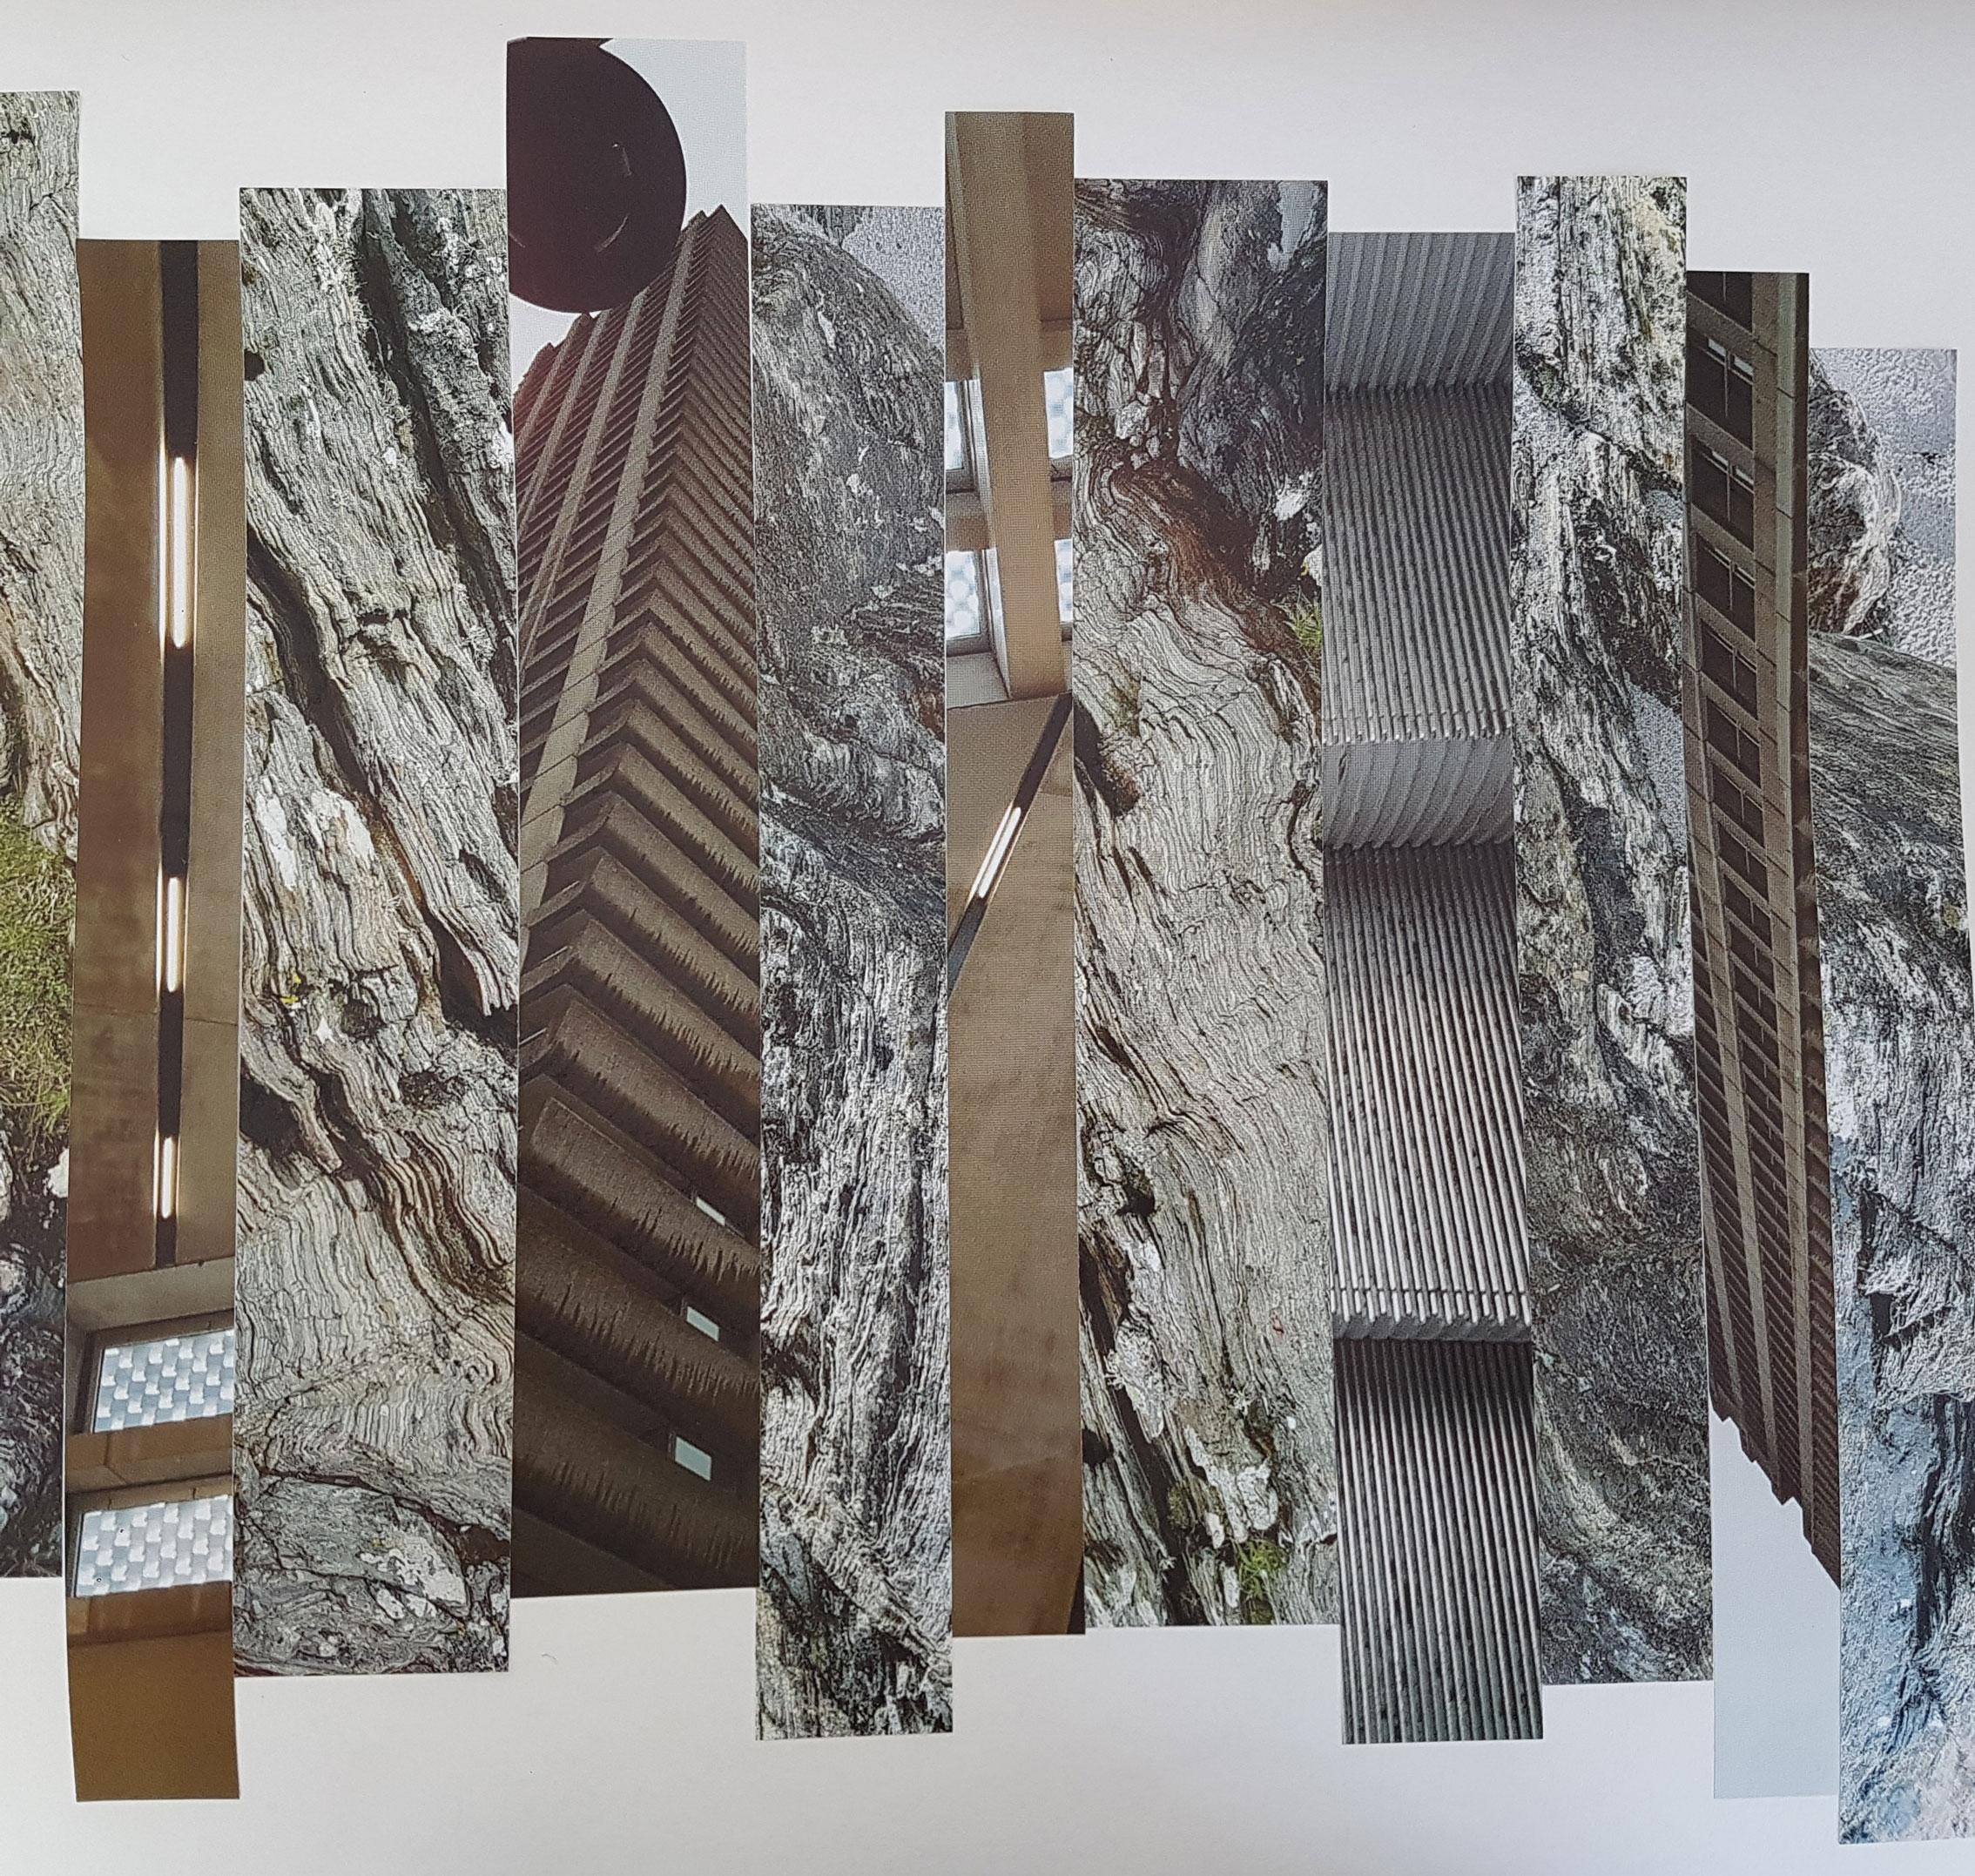 Burns, R. 2018. Collage 1. Photograph.